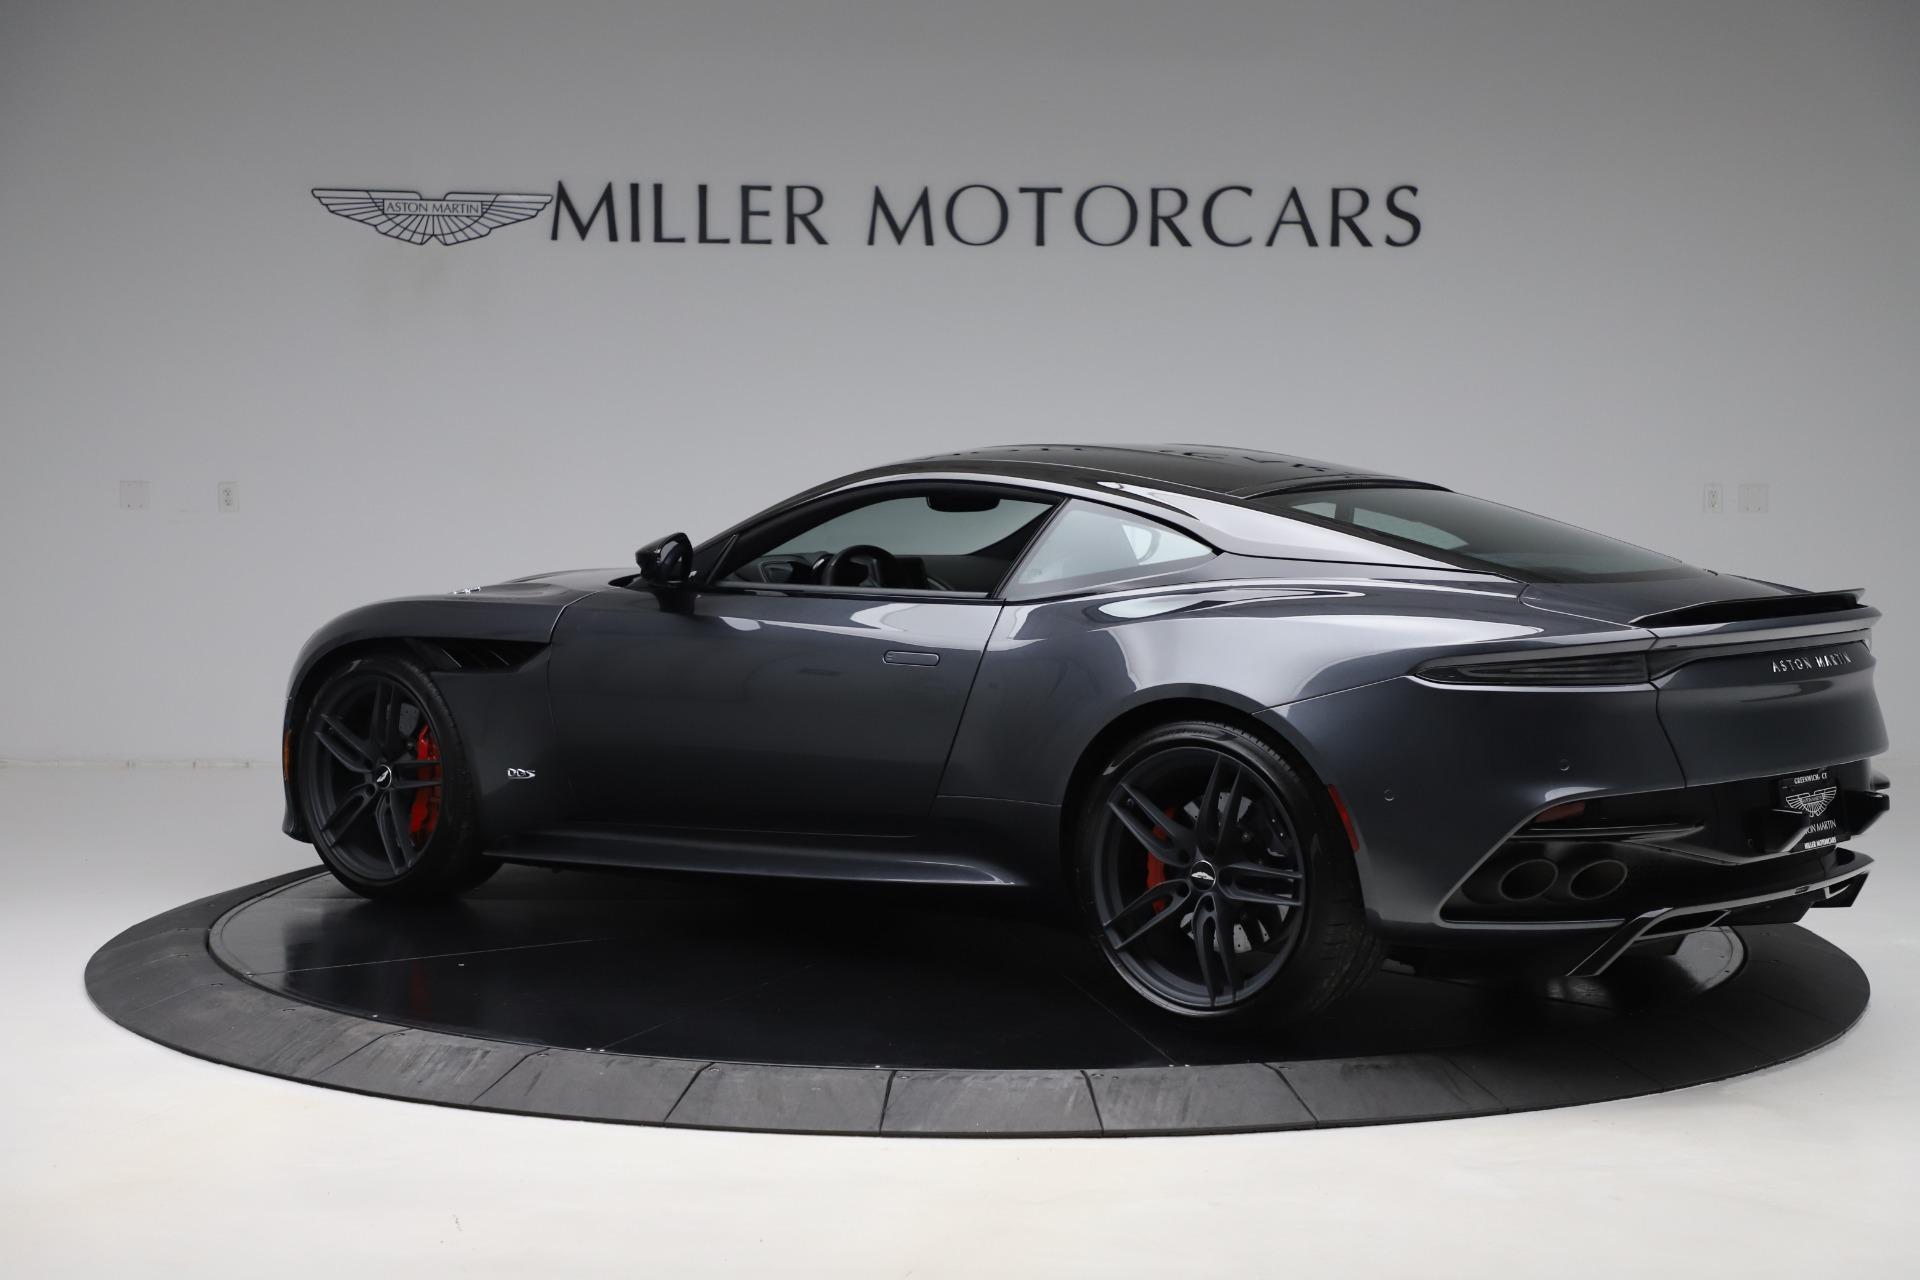 Used 2019 Aston Martin DBS Superleggera Coupe For Sale In Westport, CT 3570_p4